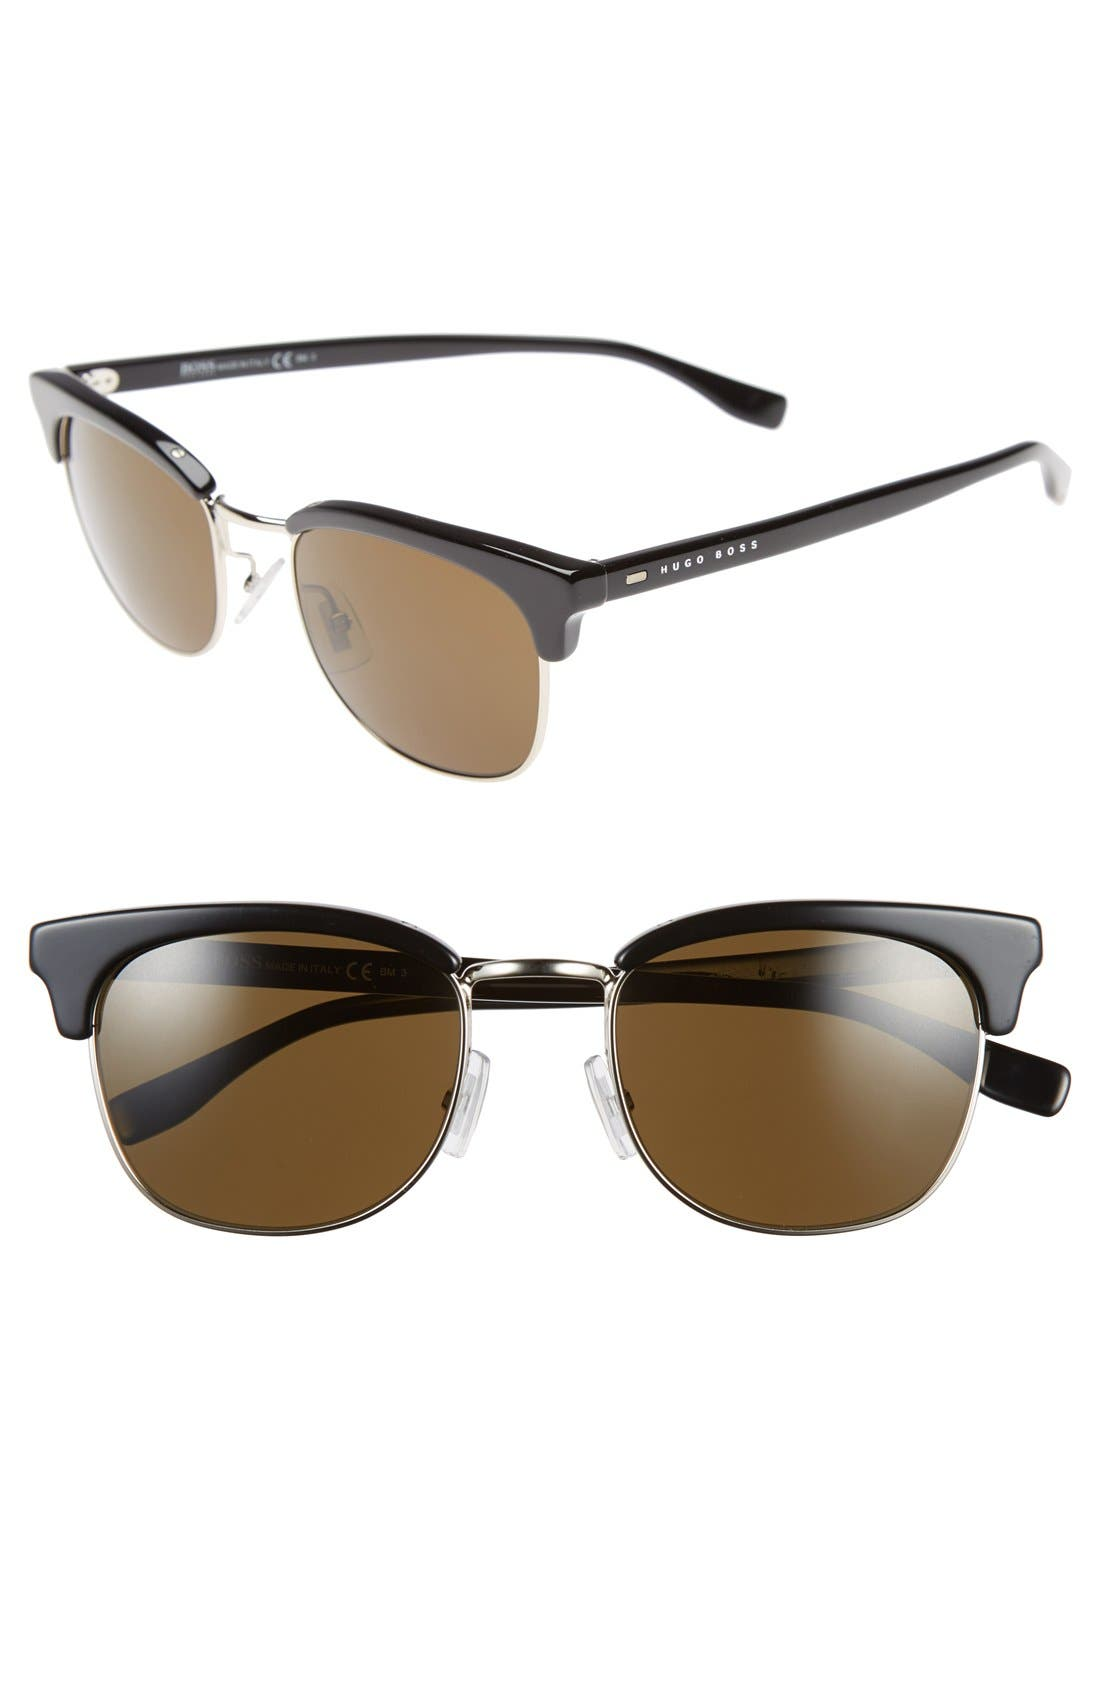 52mm Retro Sunglasses,                         Main,                         color, Black/ Pale Gold/ Brown